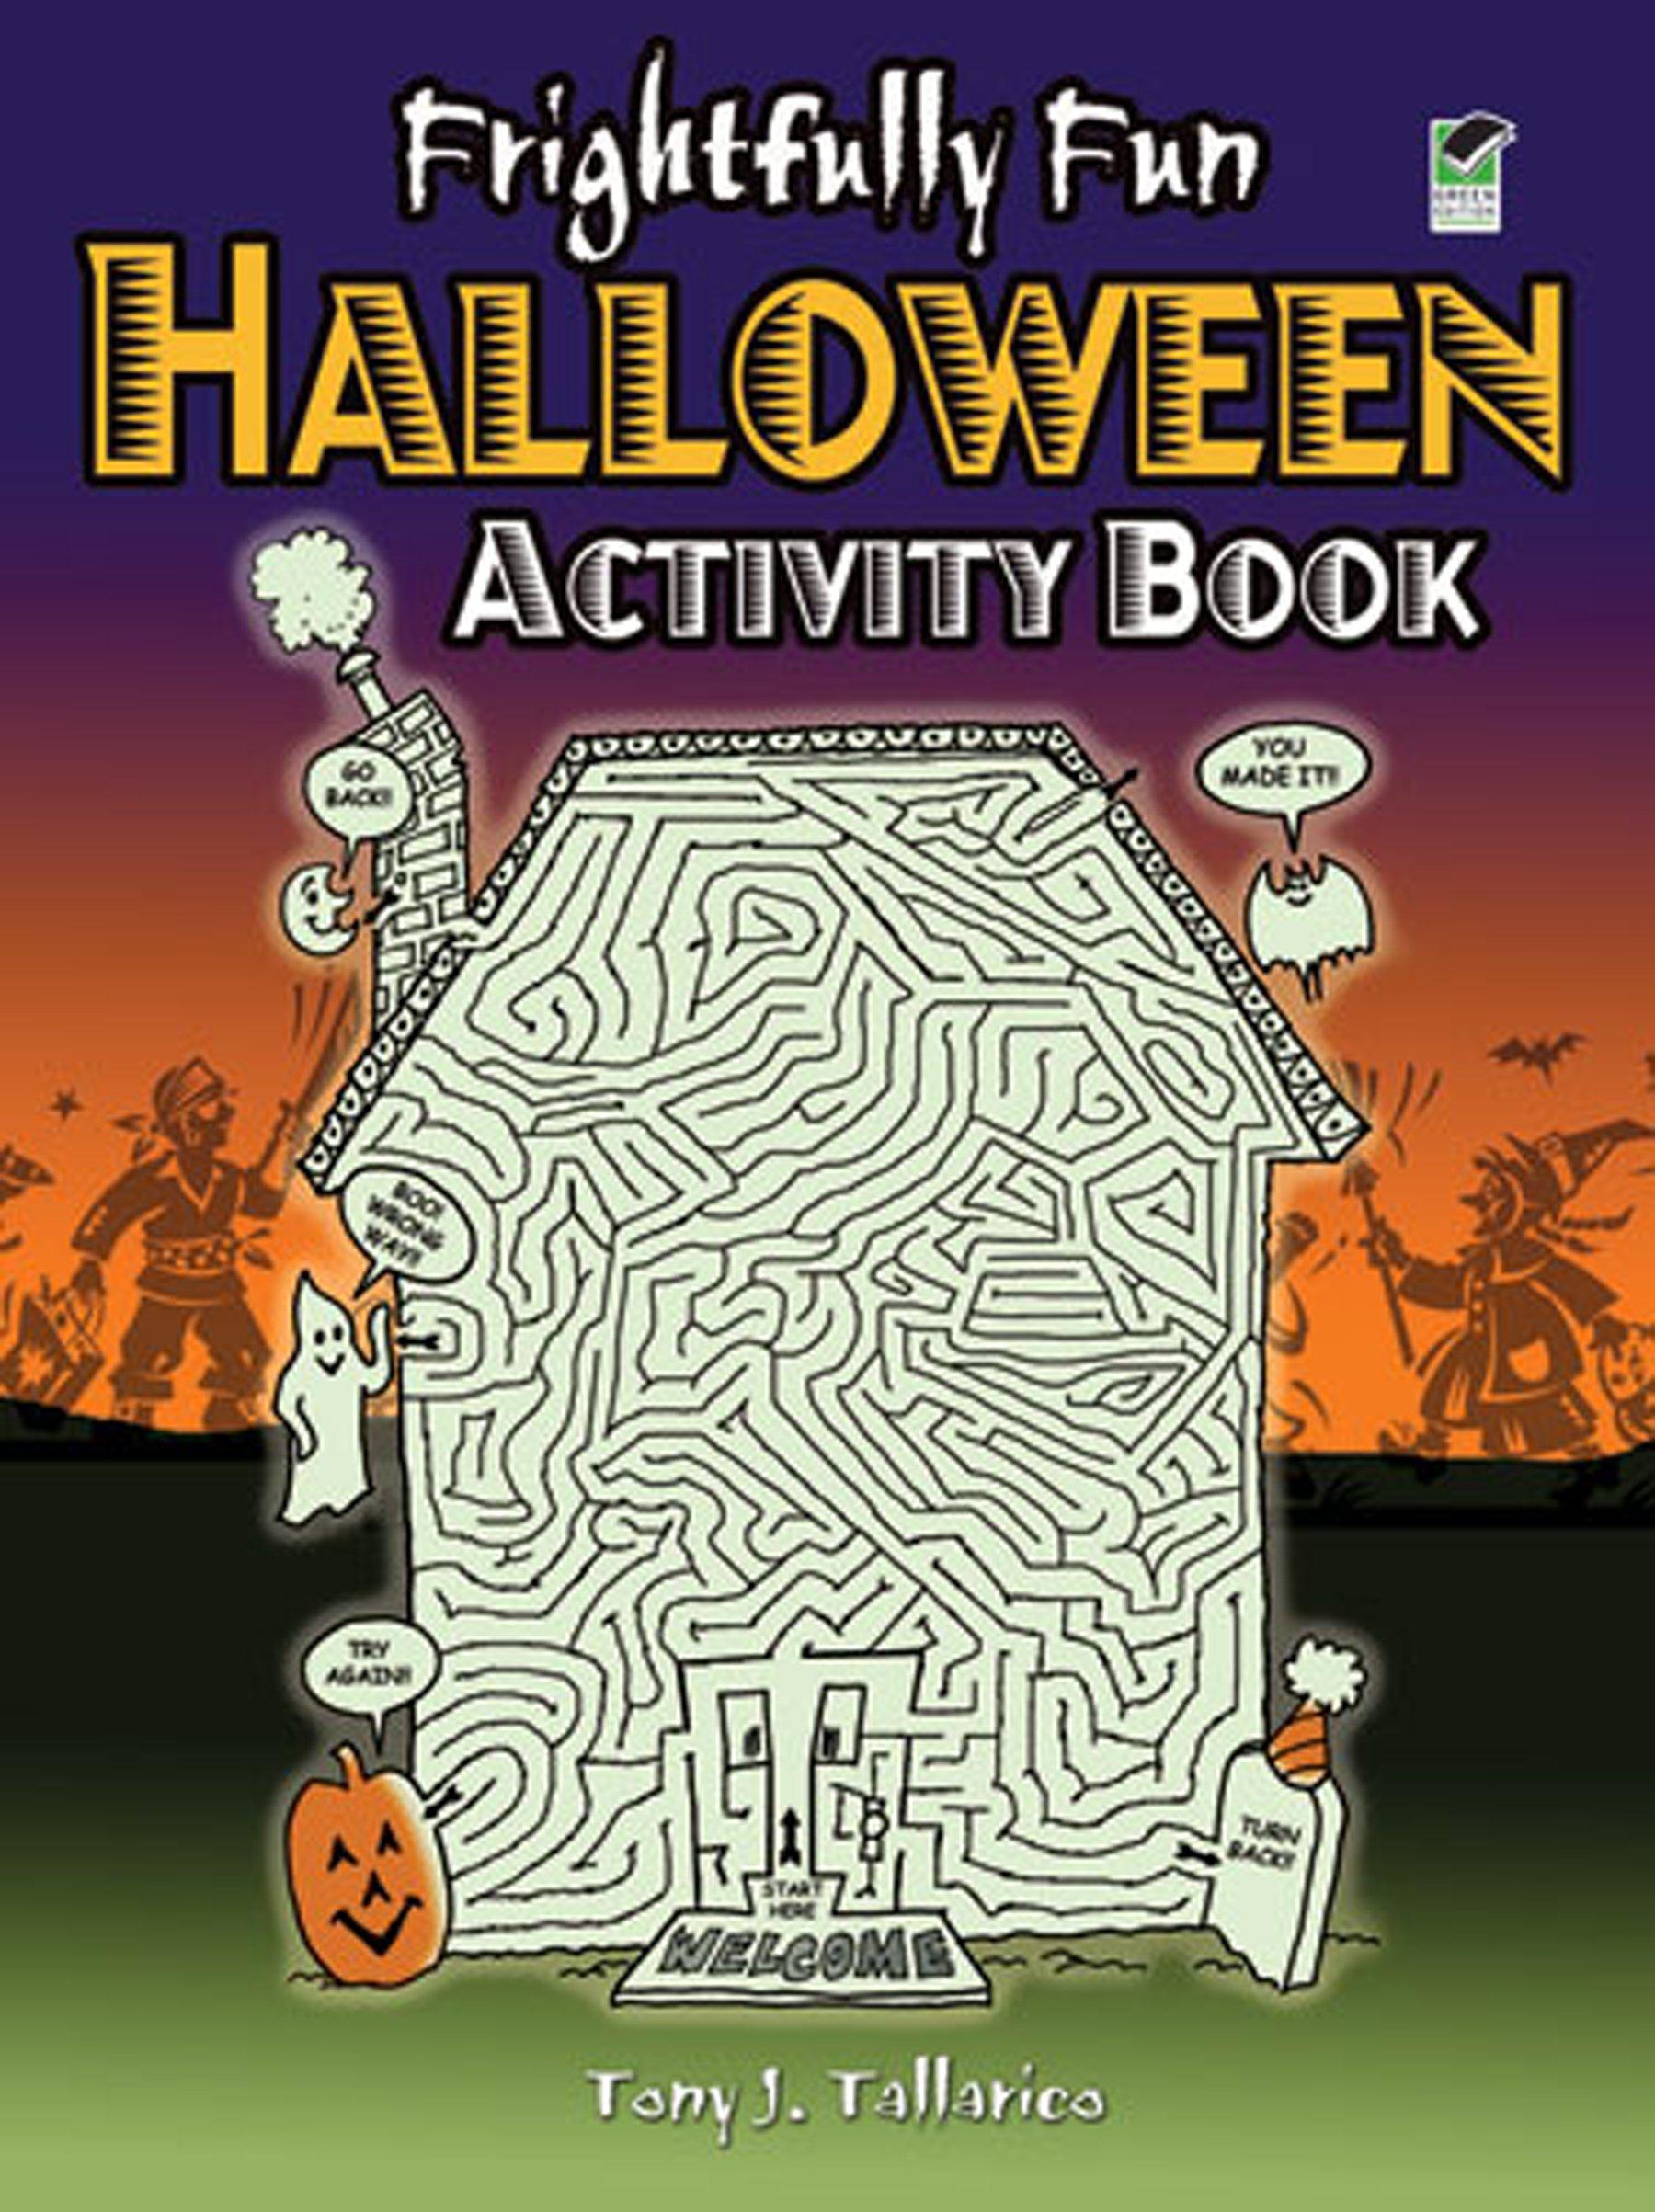 Frightfully Fun Halloween Activity Book (Dover Children's Activity Books):  Tony J. Tallarico Jr.: 0800759471317: Amazon.com: Books